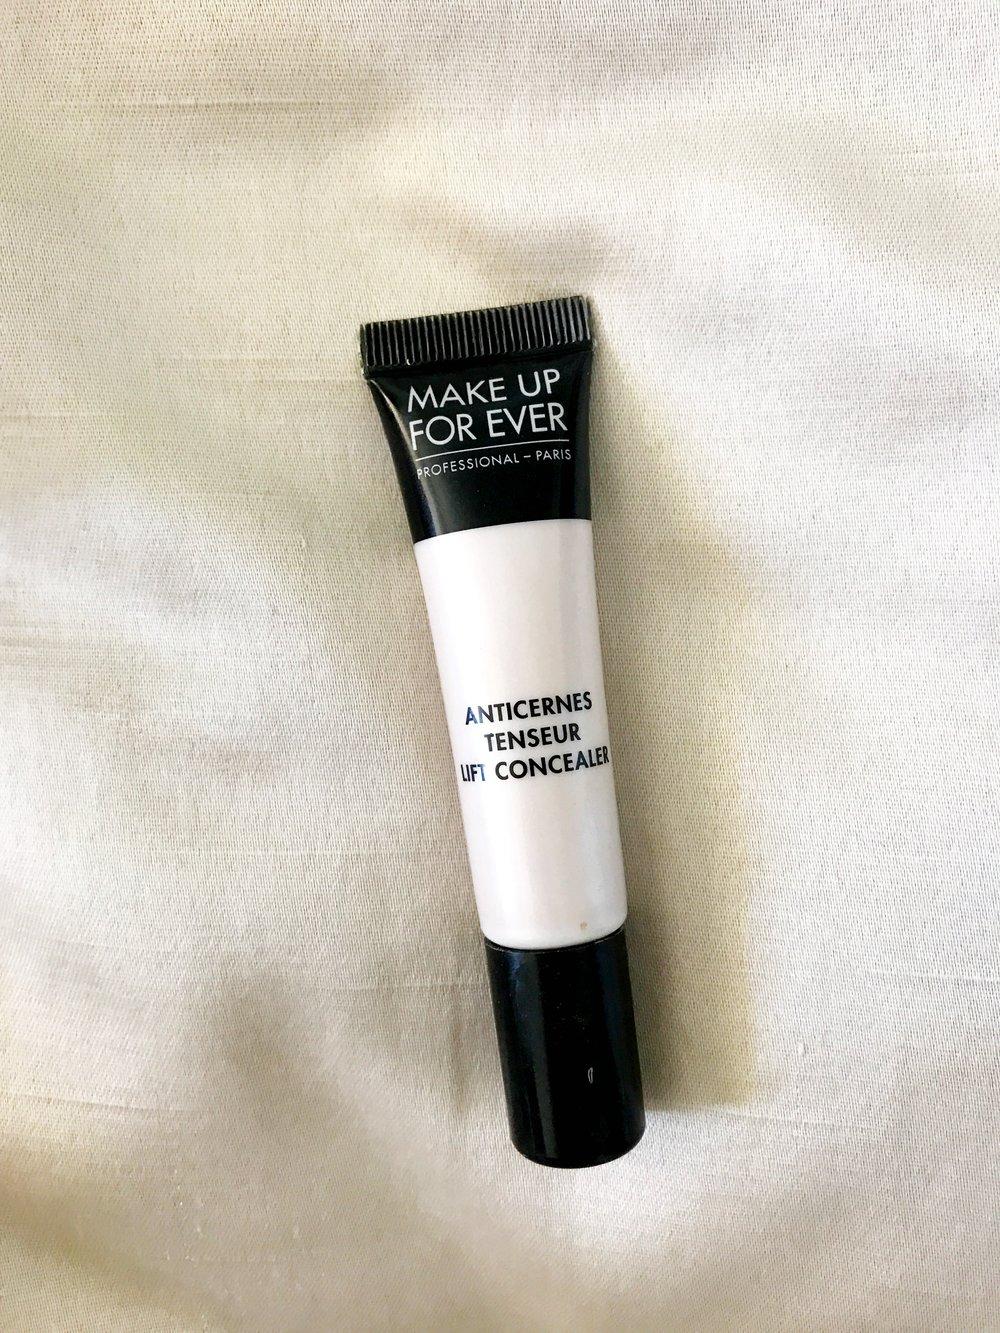 Lift Concealer by Make Up For Ever